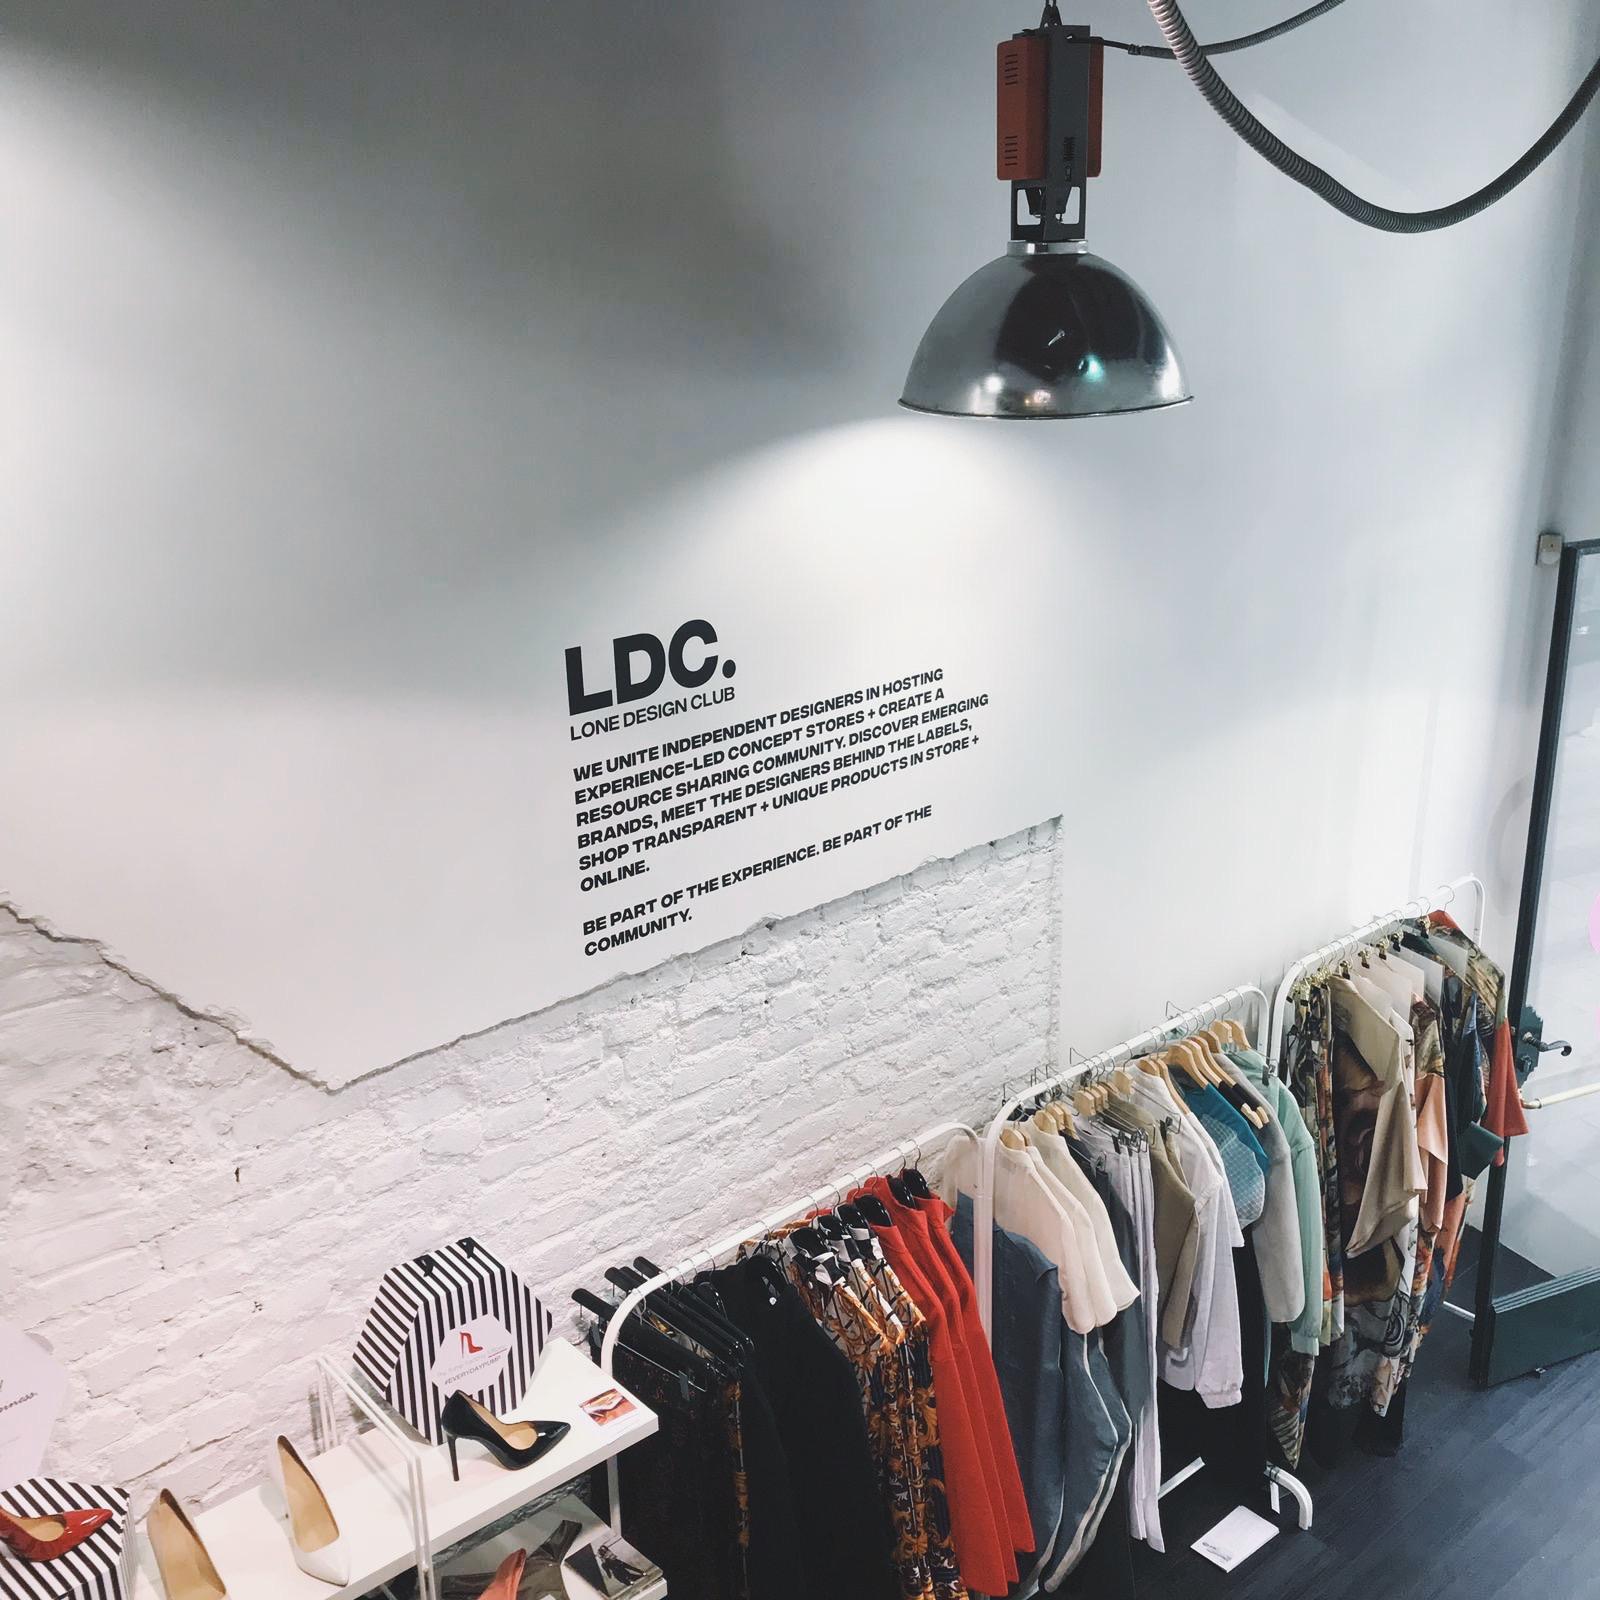 Lone Design Club